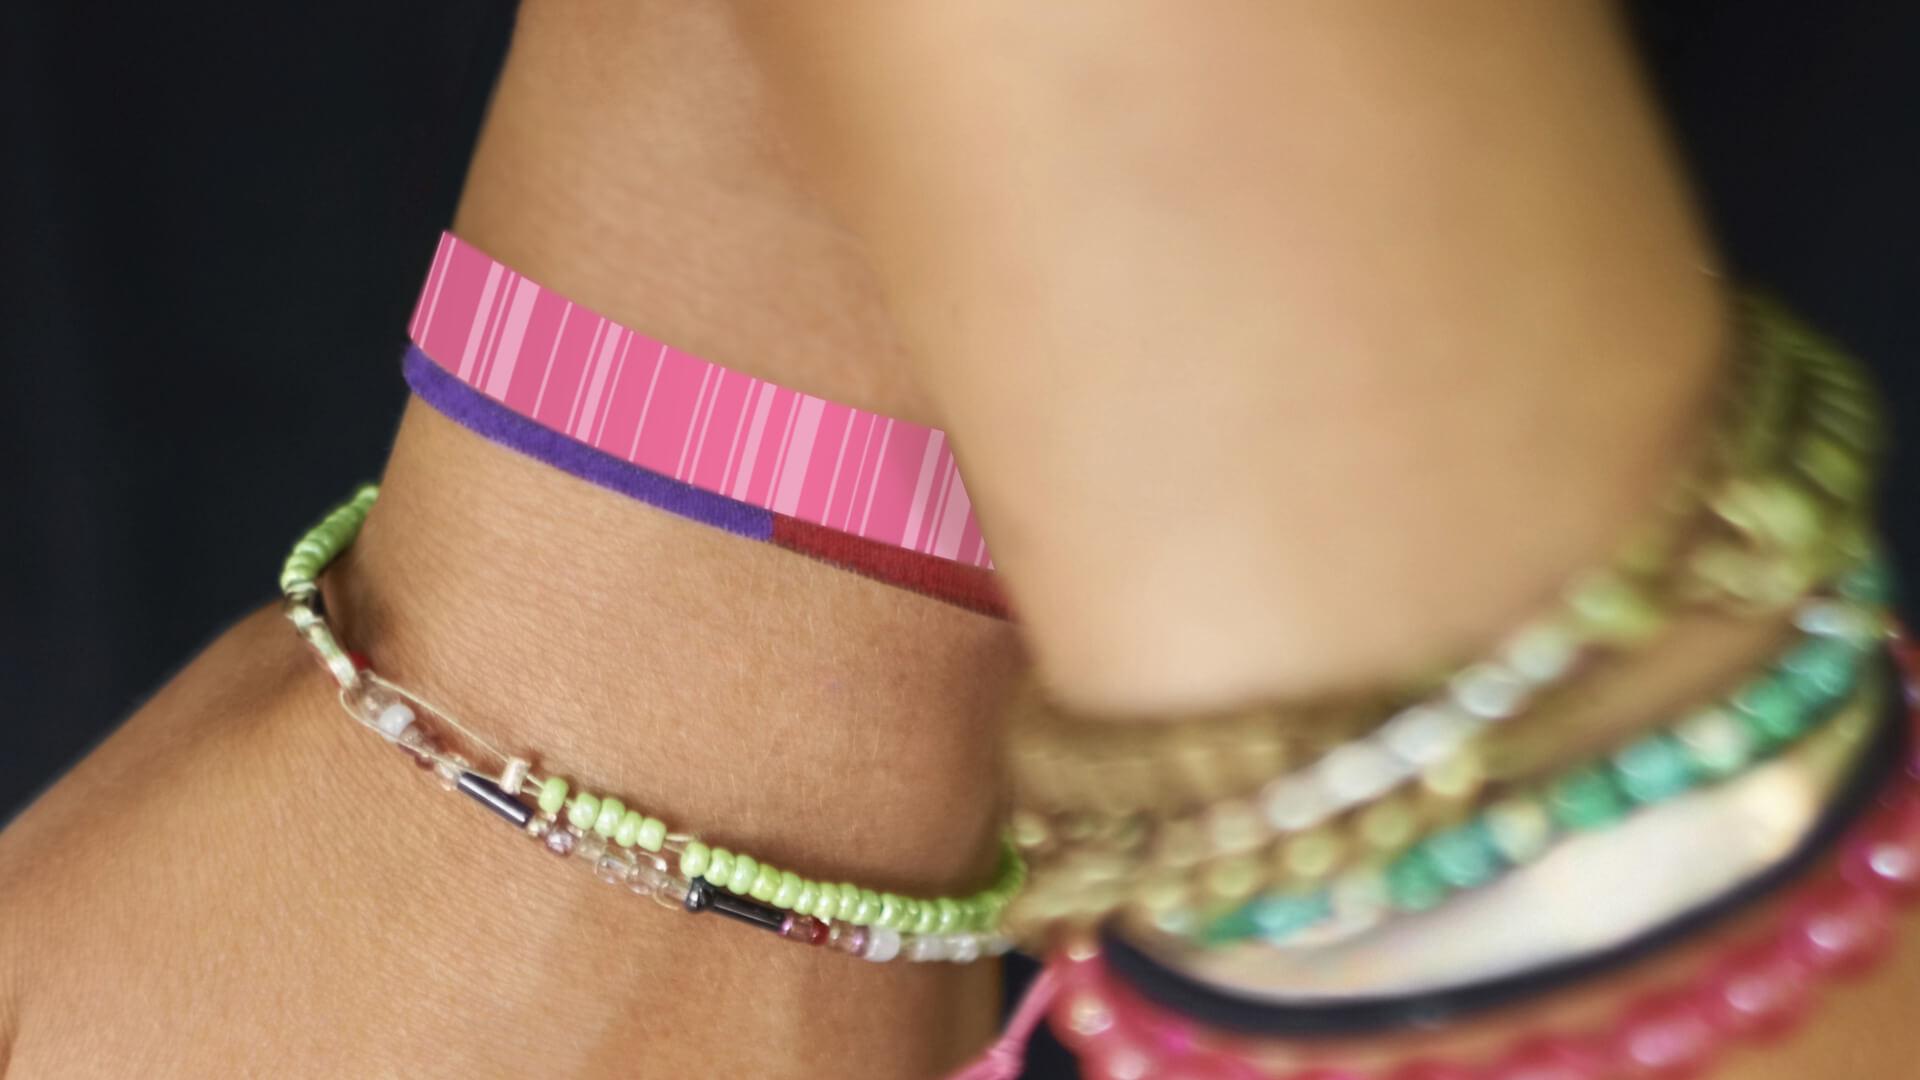 BevBands Drink ID Wristbands